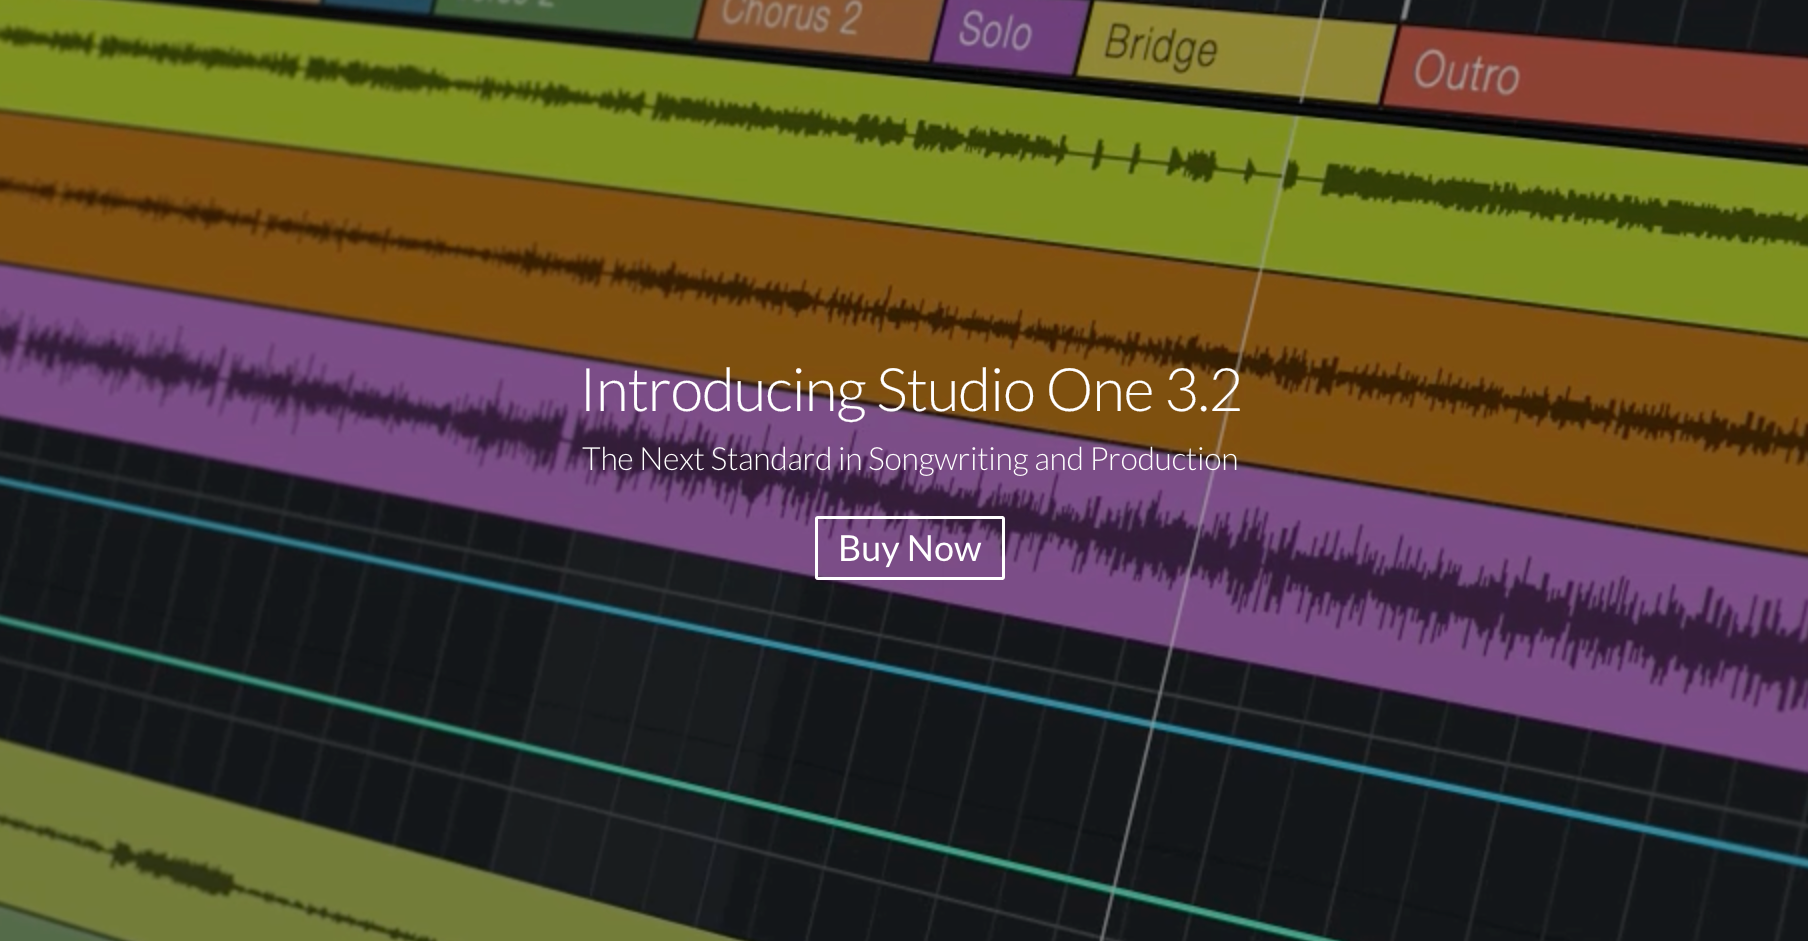 StudioOne3.2で何が変わったかをショートカットの追加で確認してみた